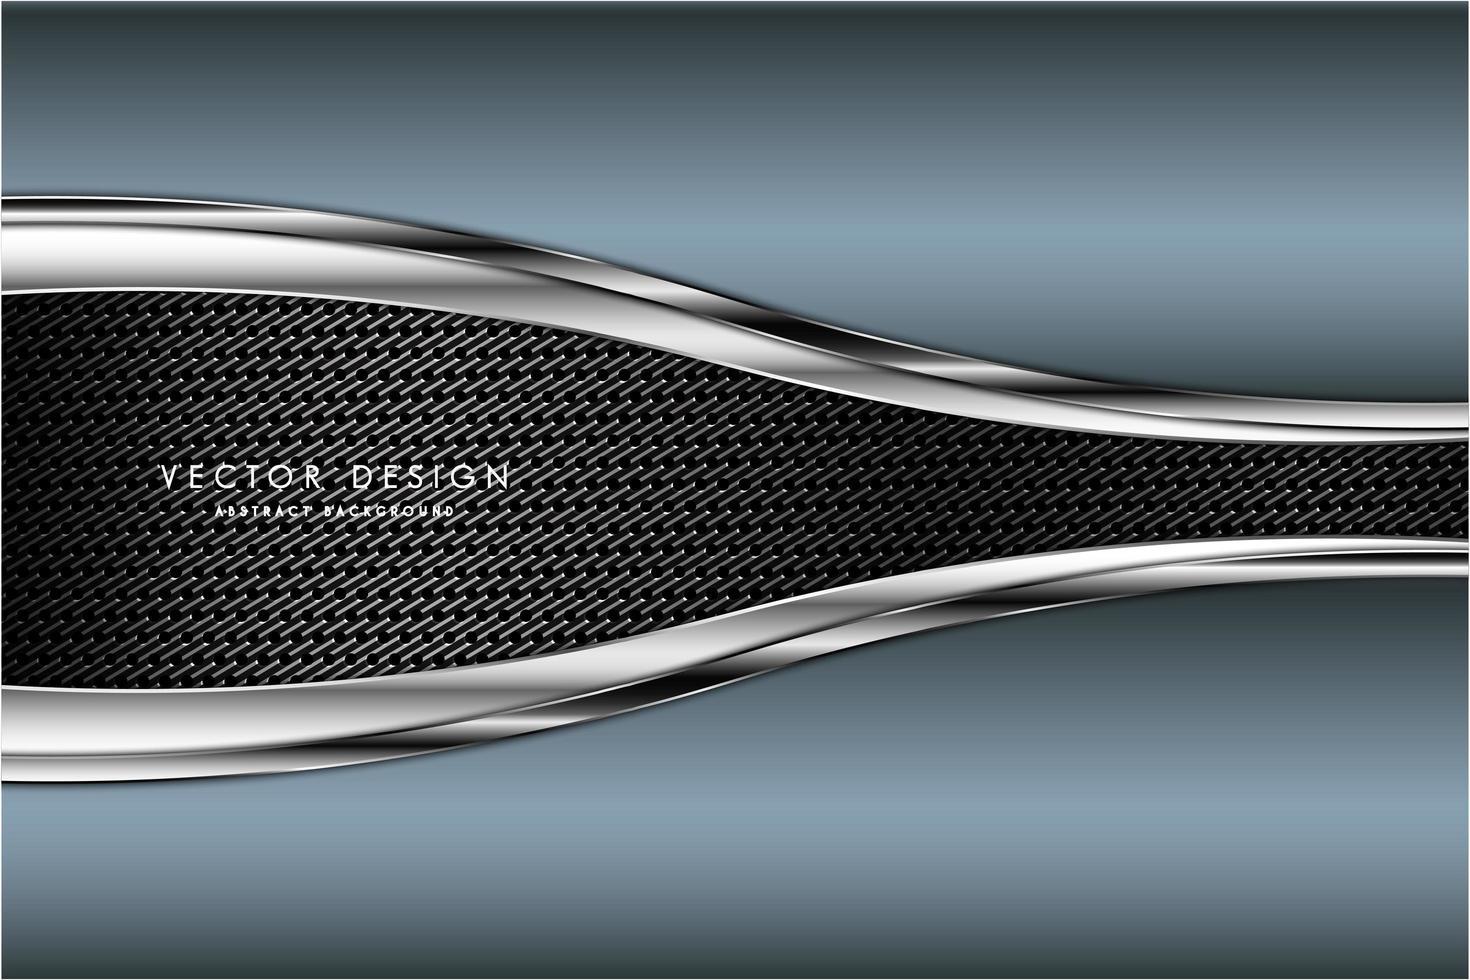 Paneles metálicos azules y plateados sobre textura de fibra de carbono vector